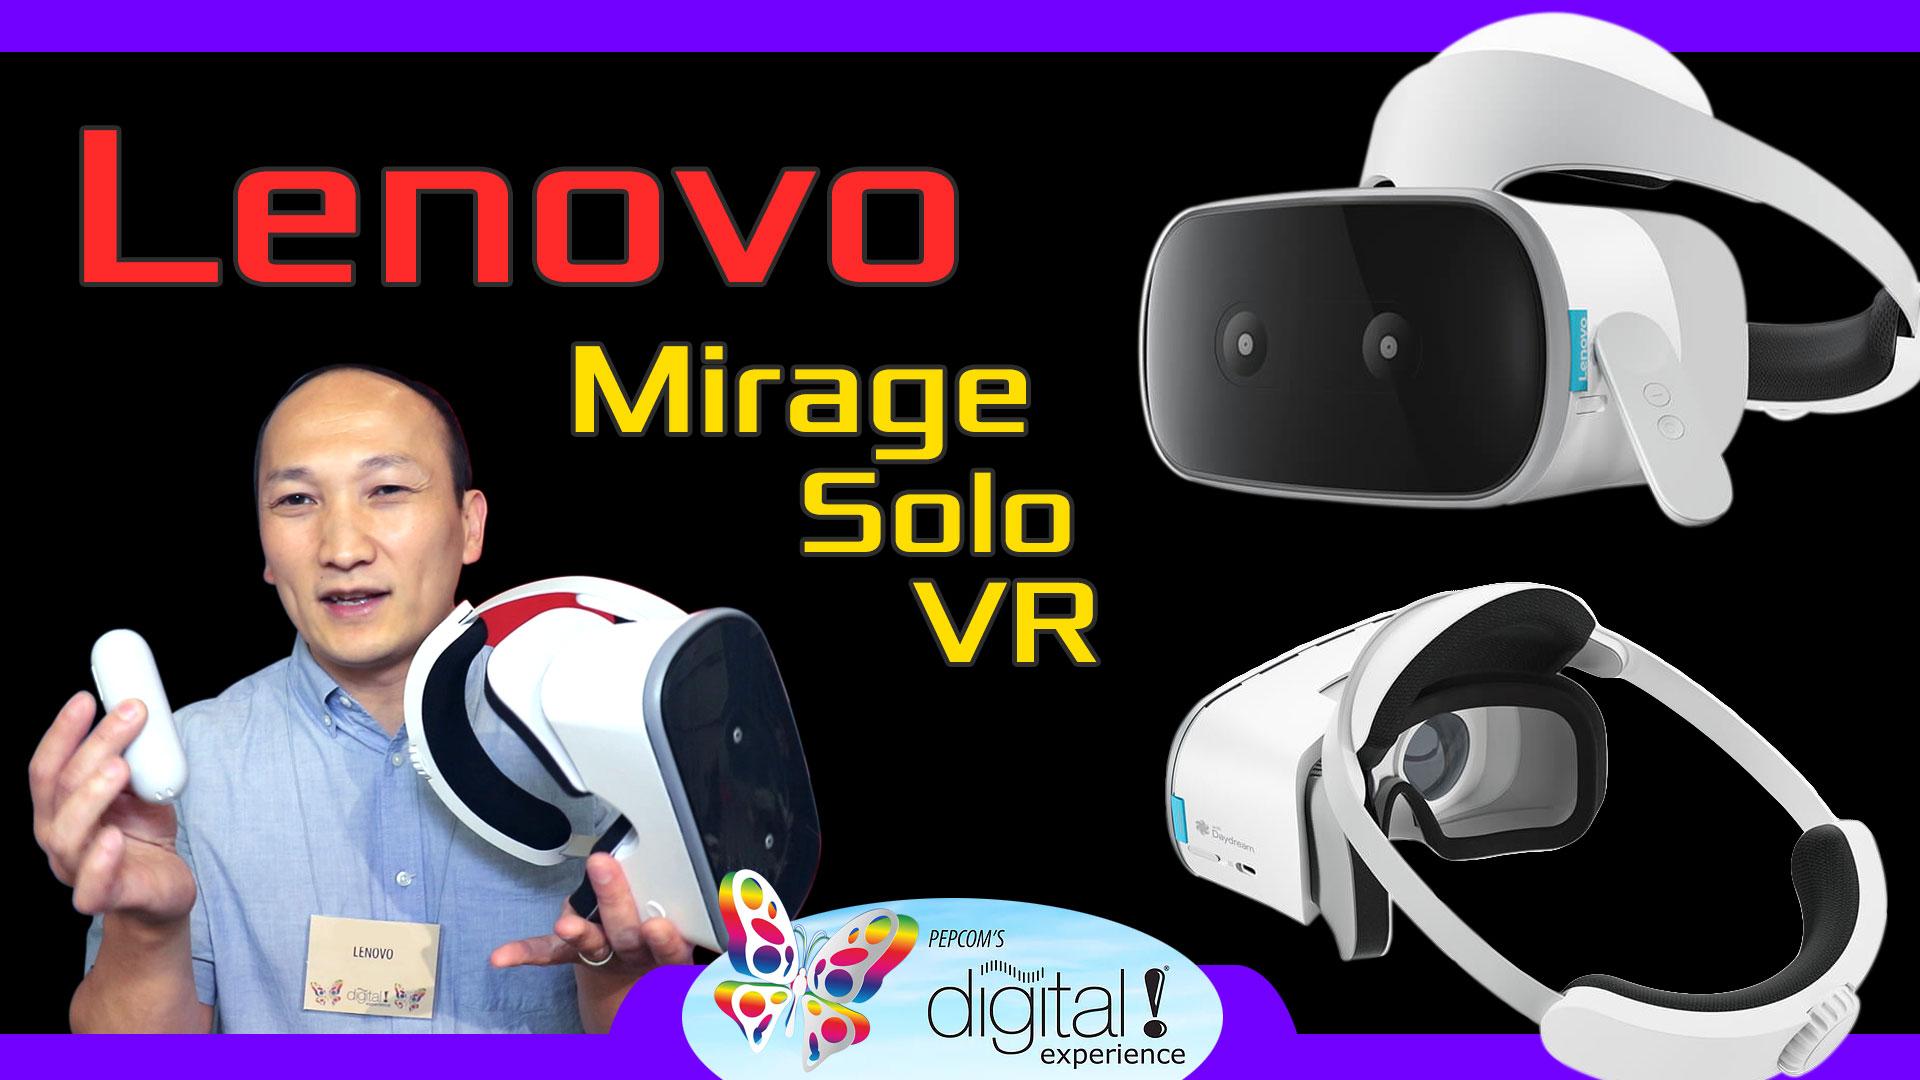 Lenovo Mirage Solo VR